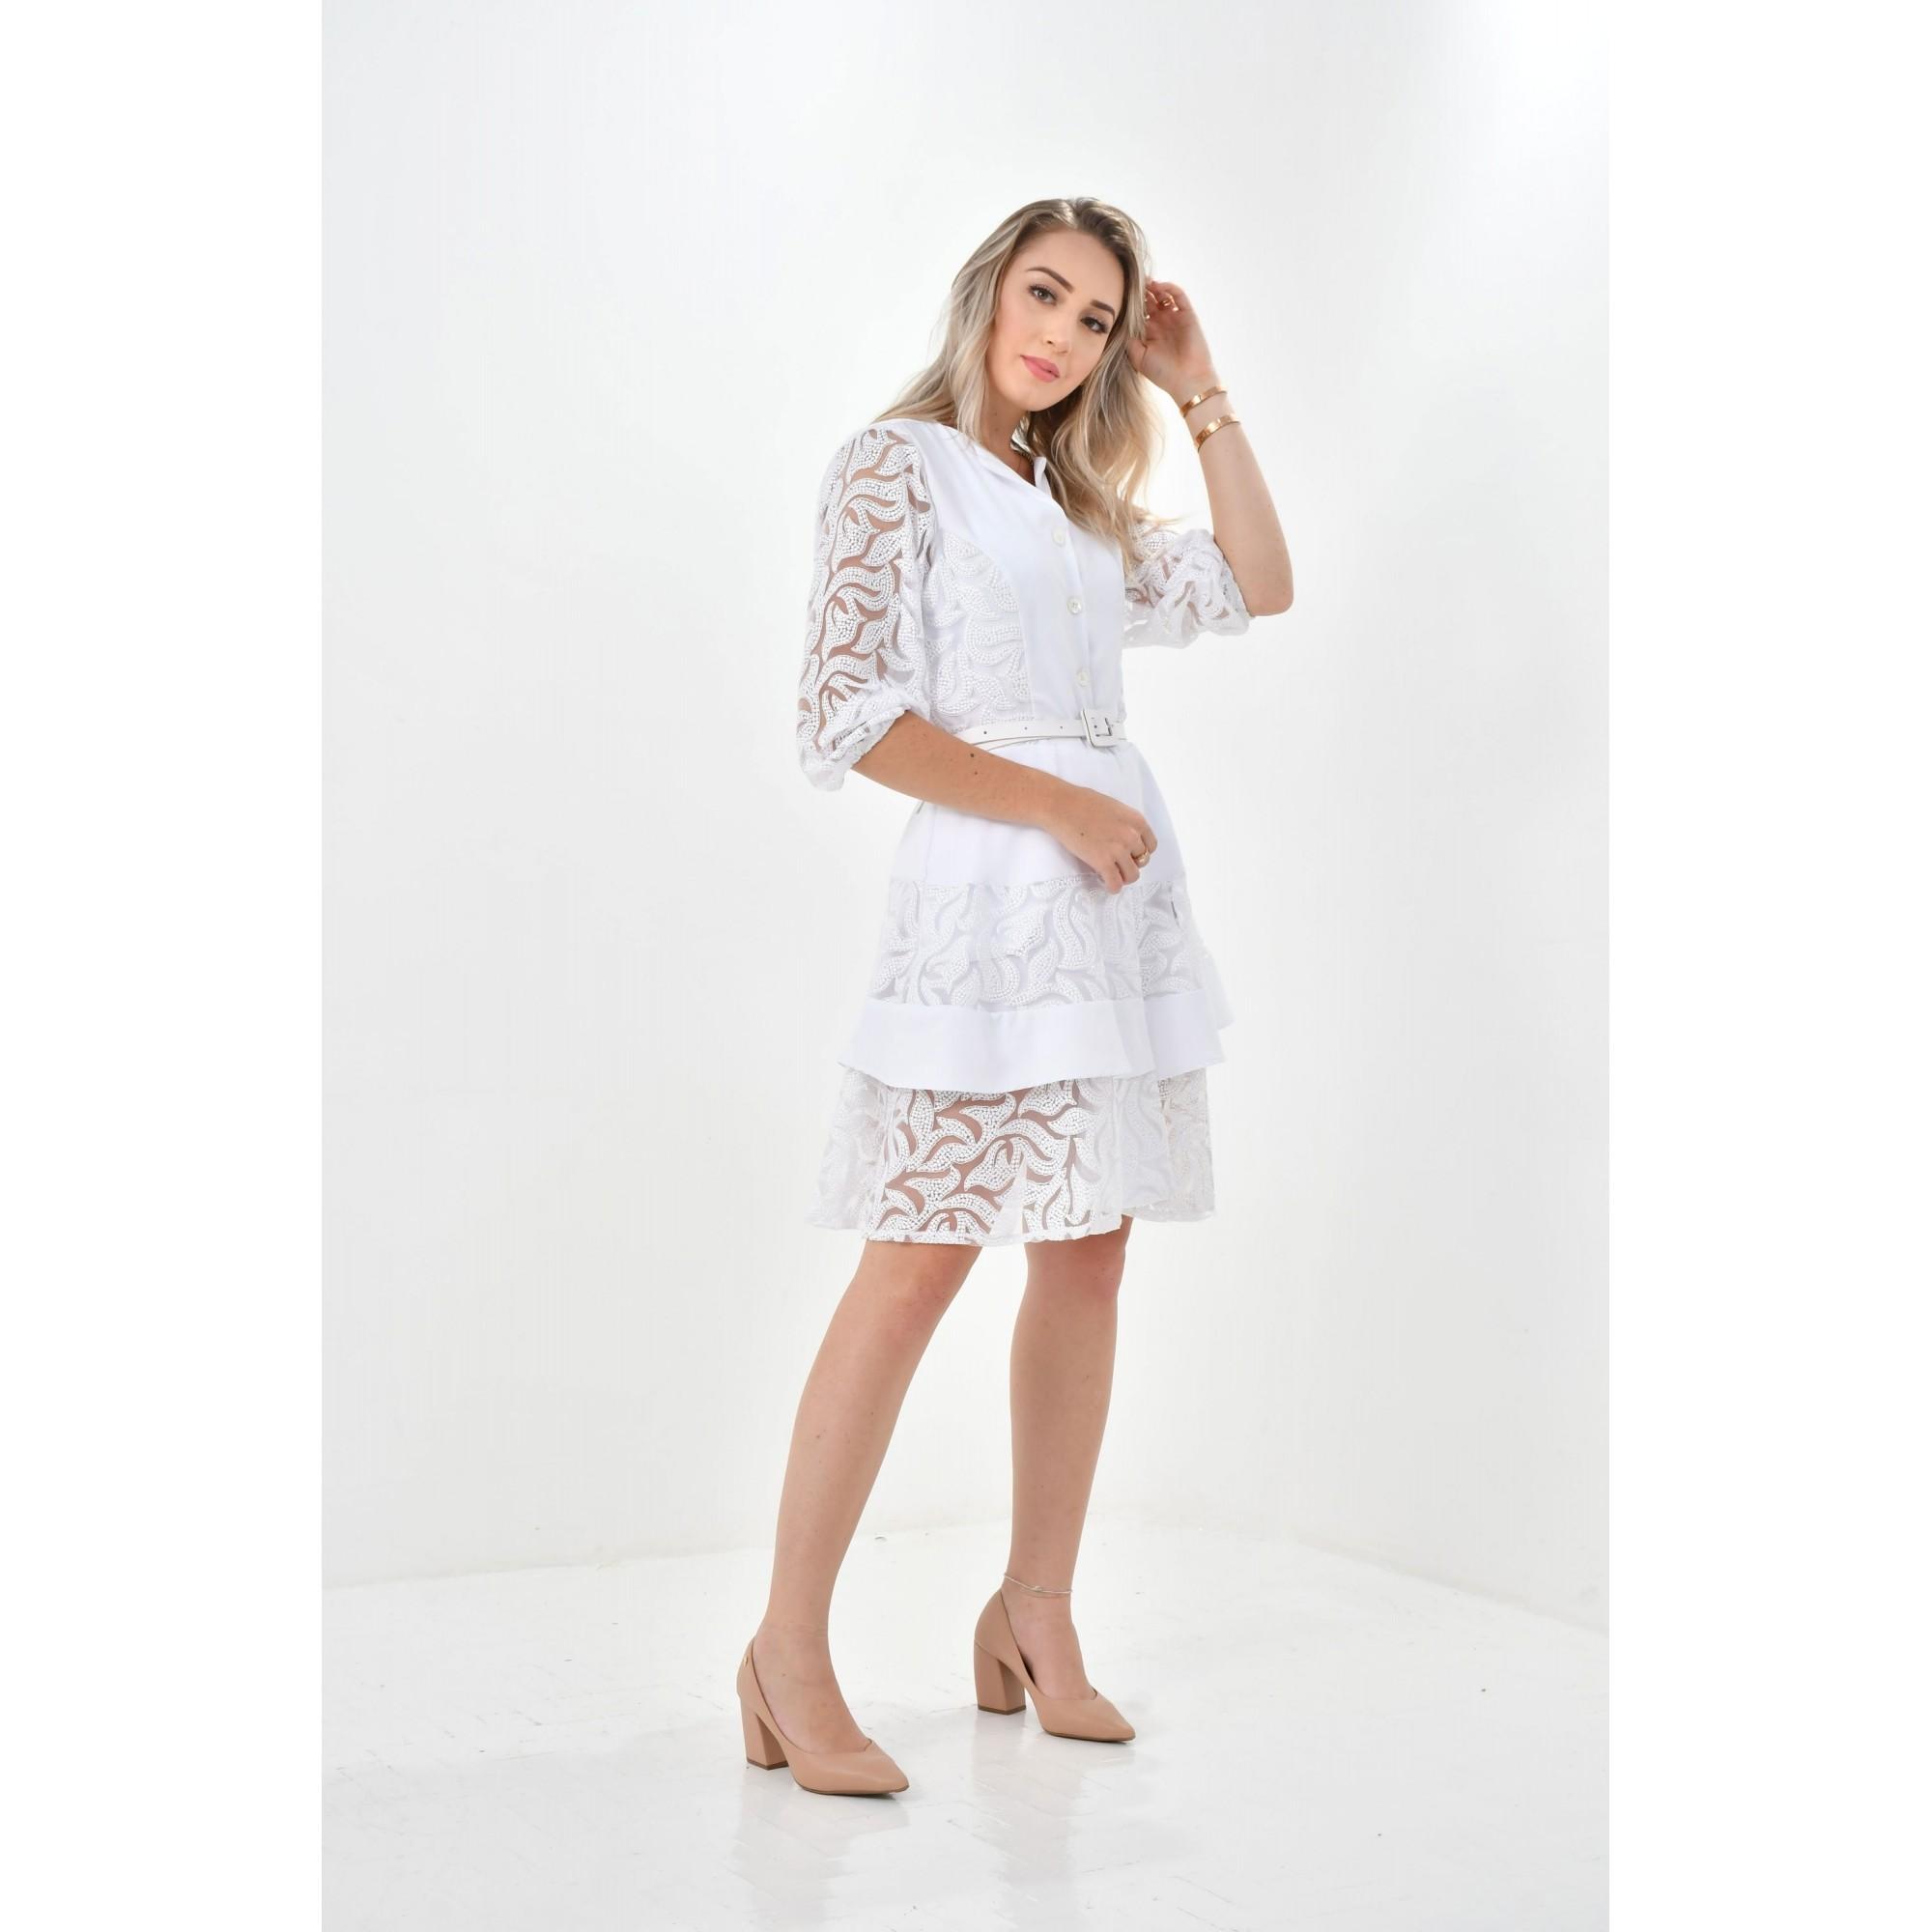 Jaleco Natalia  - Luxo Branco - Jalecos Personalizado Feminino